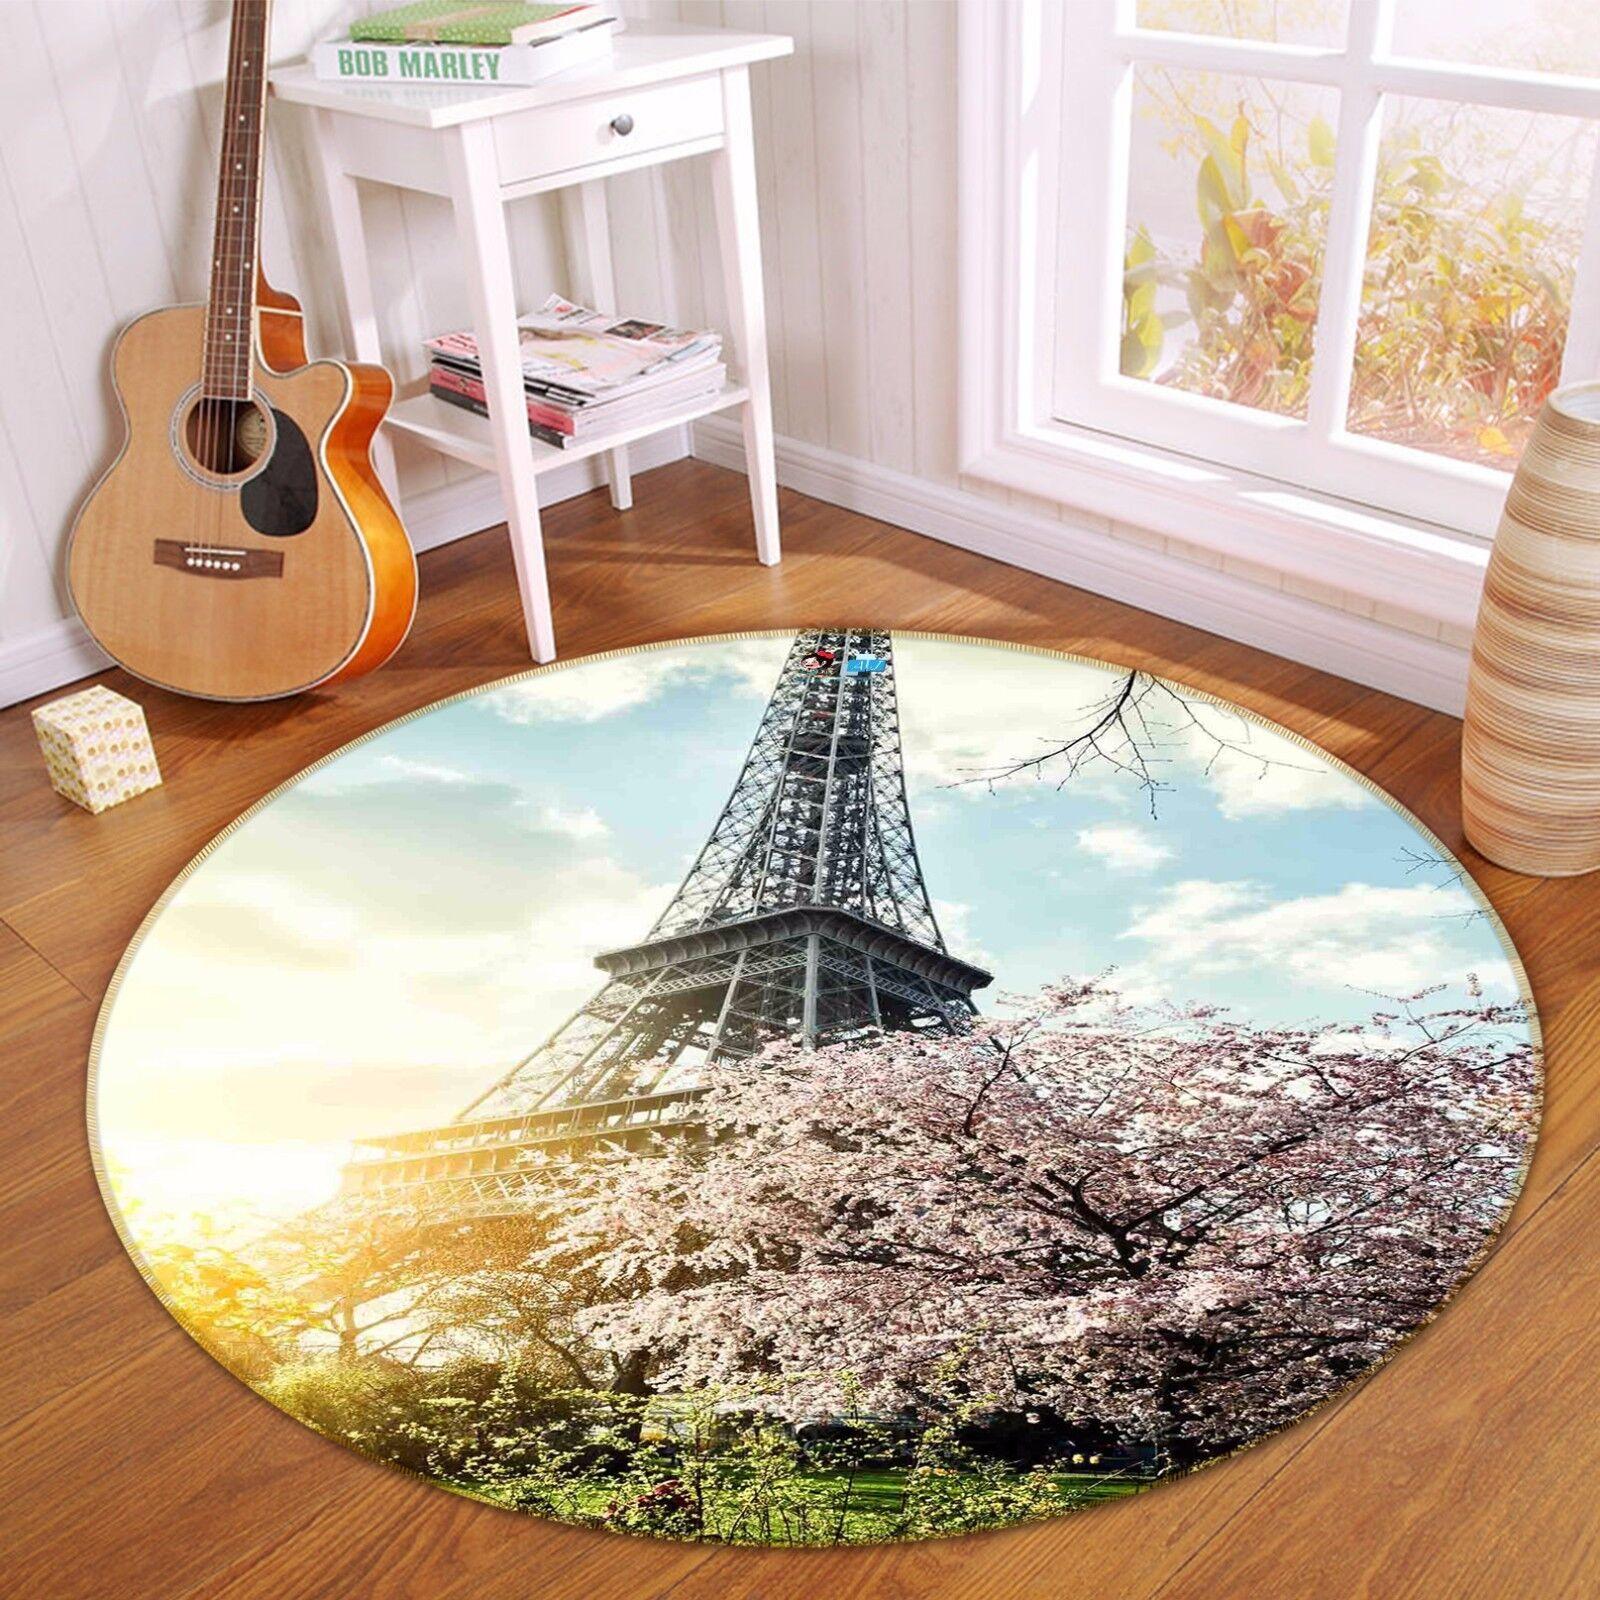 3D Eiffel Tower 45 Non Non Non Slip Rug Mat Room Mat Round Quality Elegant Photo Carpet 014267